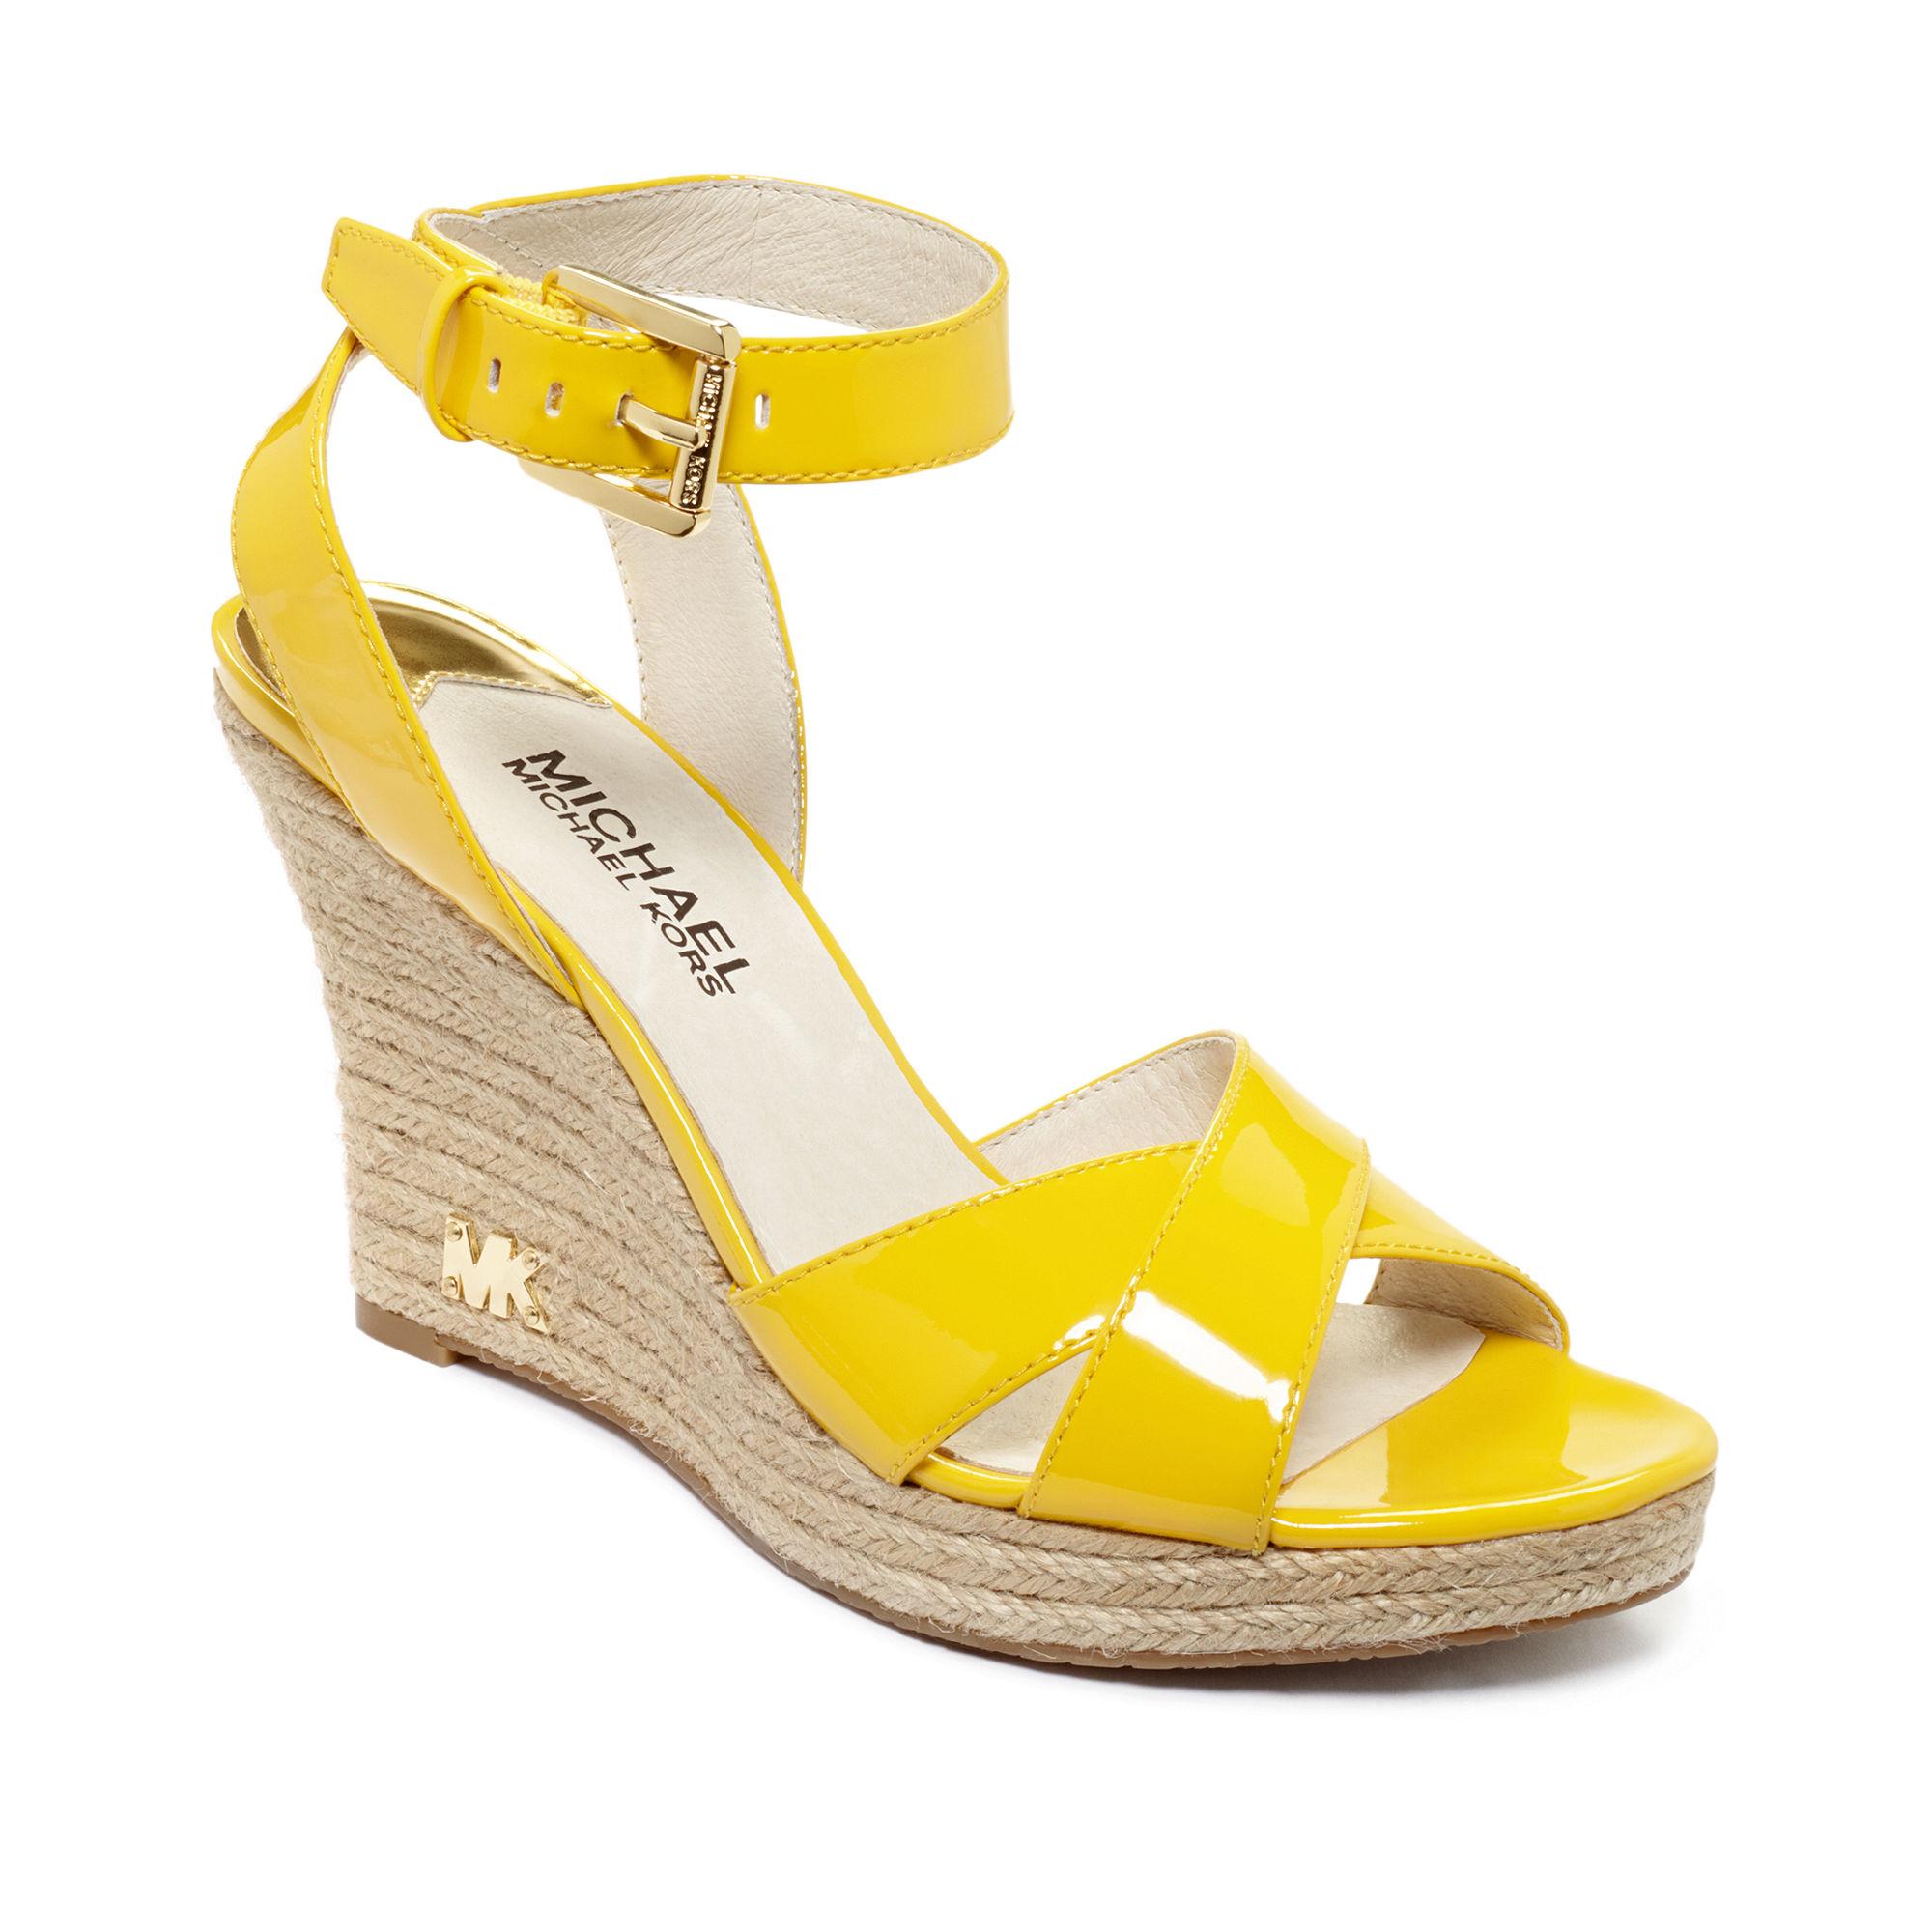 Michael kors Kami Platform Wedge Sandals in Yellow   Lyst